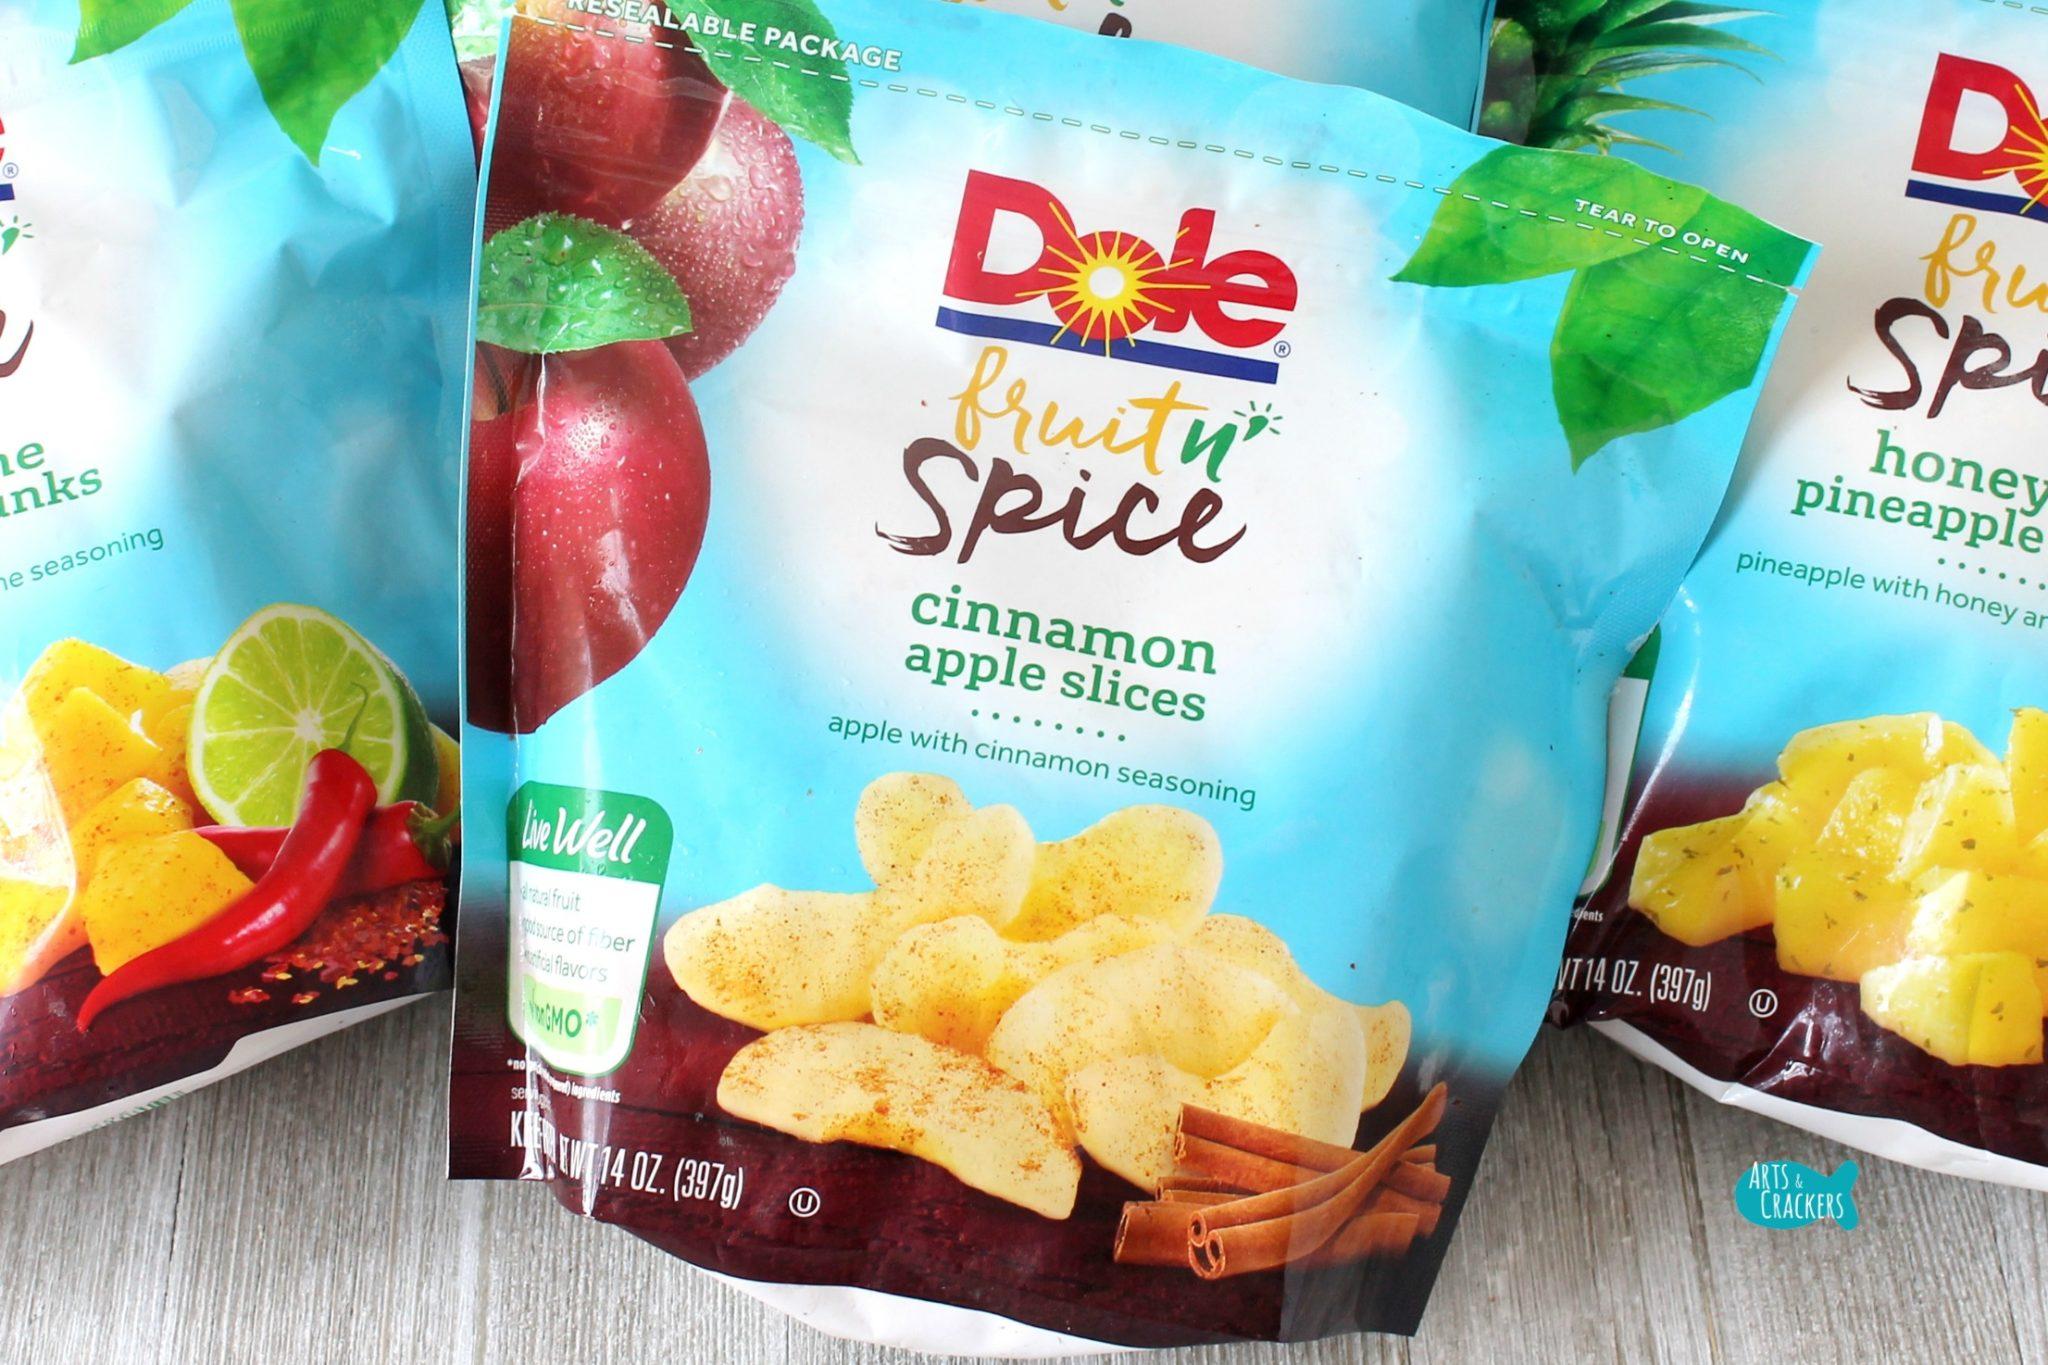 DOLE Fruit n' Spice Apple